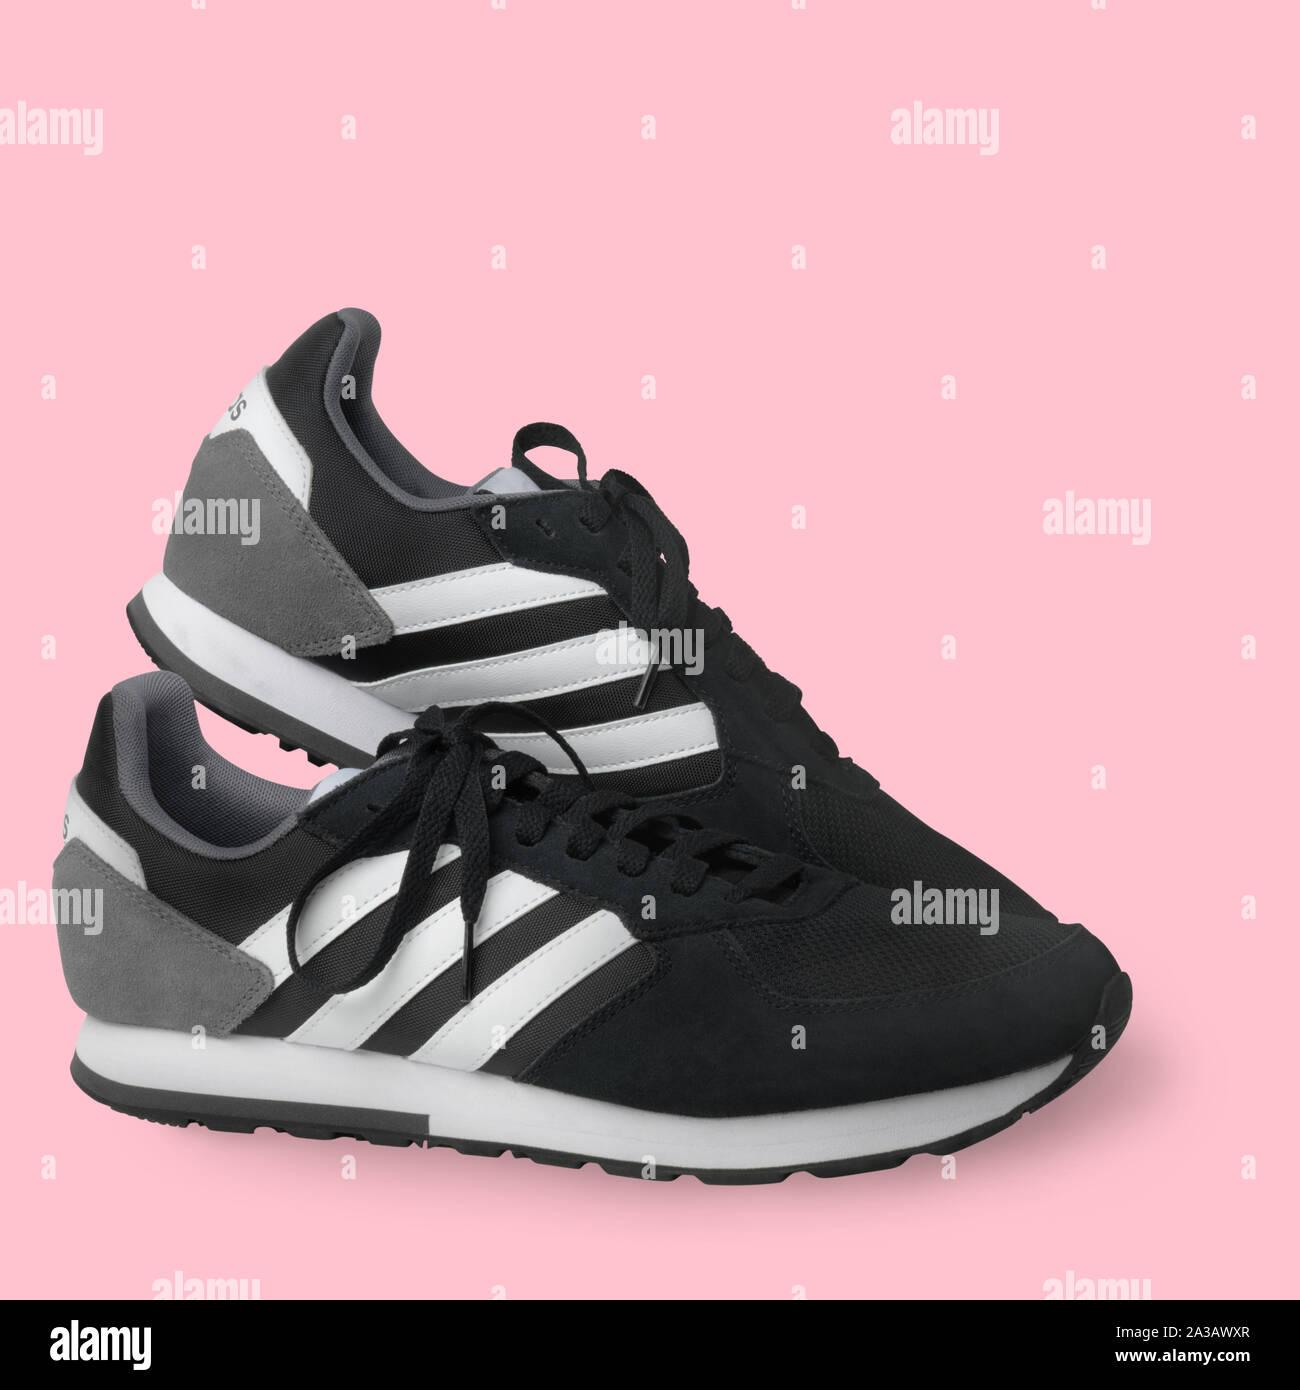 Adidas Original Immagini & Adidas Original Fotos Stock Alamy